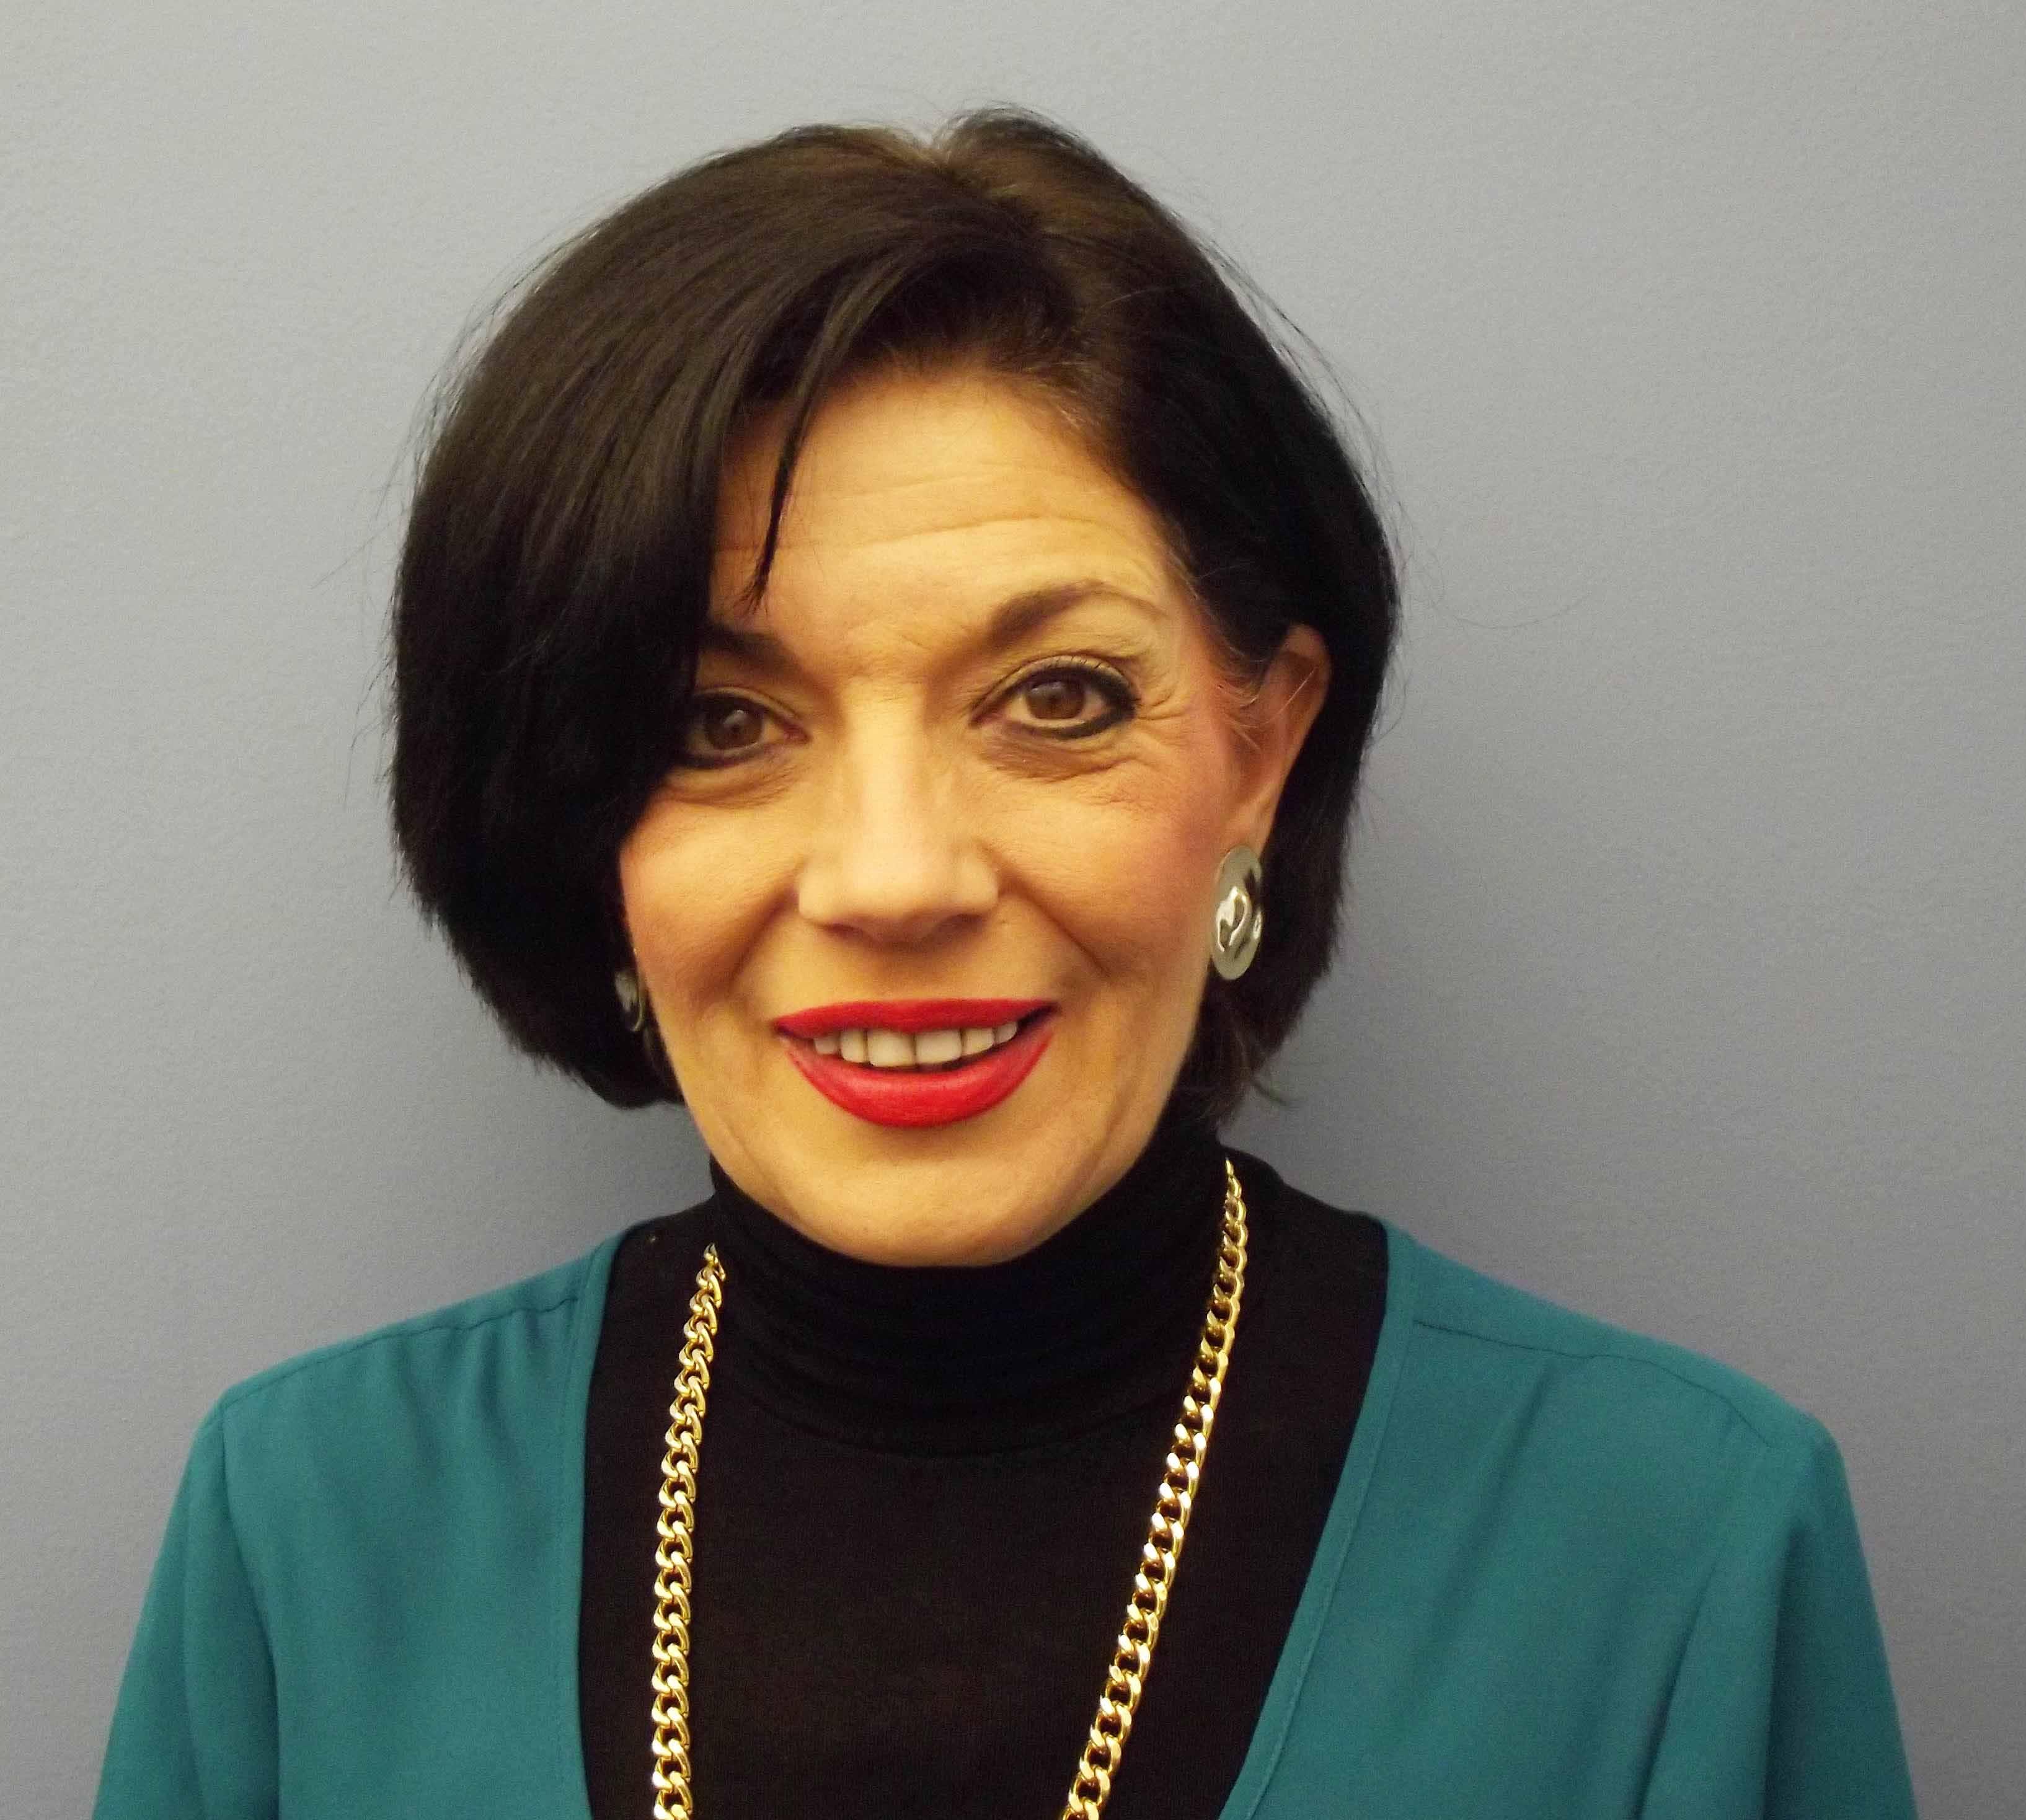 McGowan Institute development director Ms. Cynthia P. Cavallucci